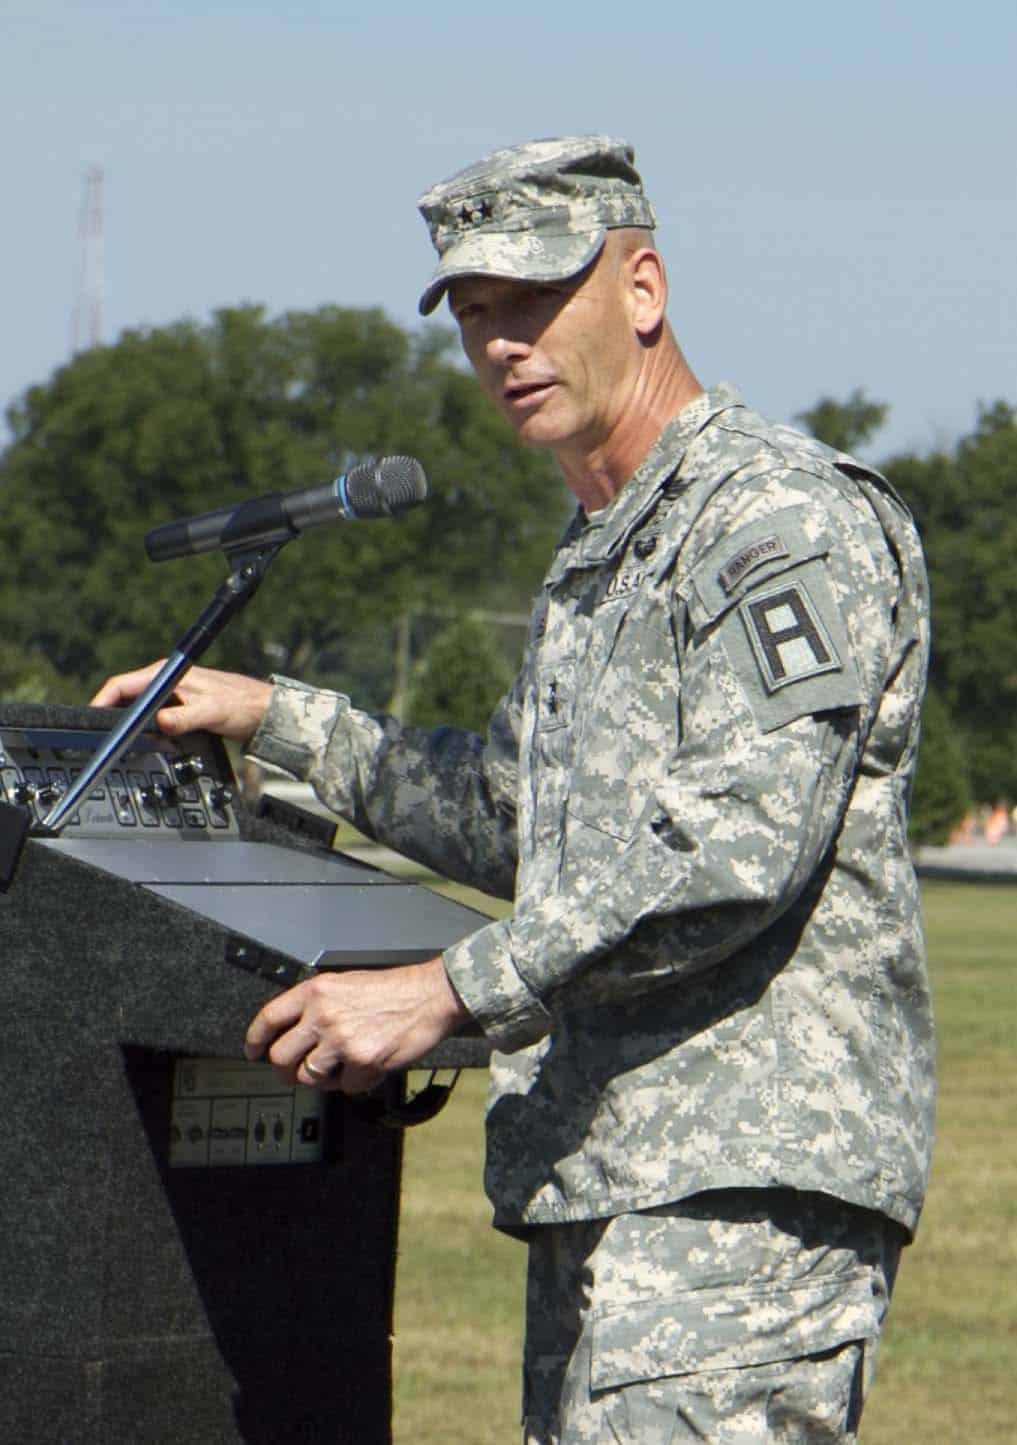 Maj. Gen. Jeffrey L. Bailey speaks at the podium.